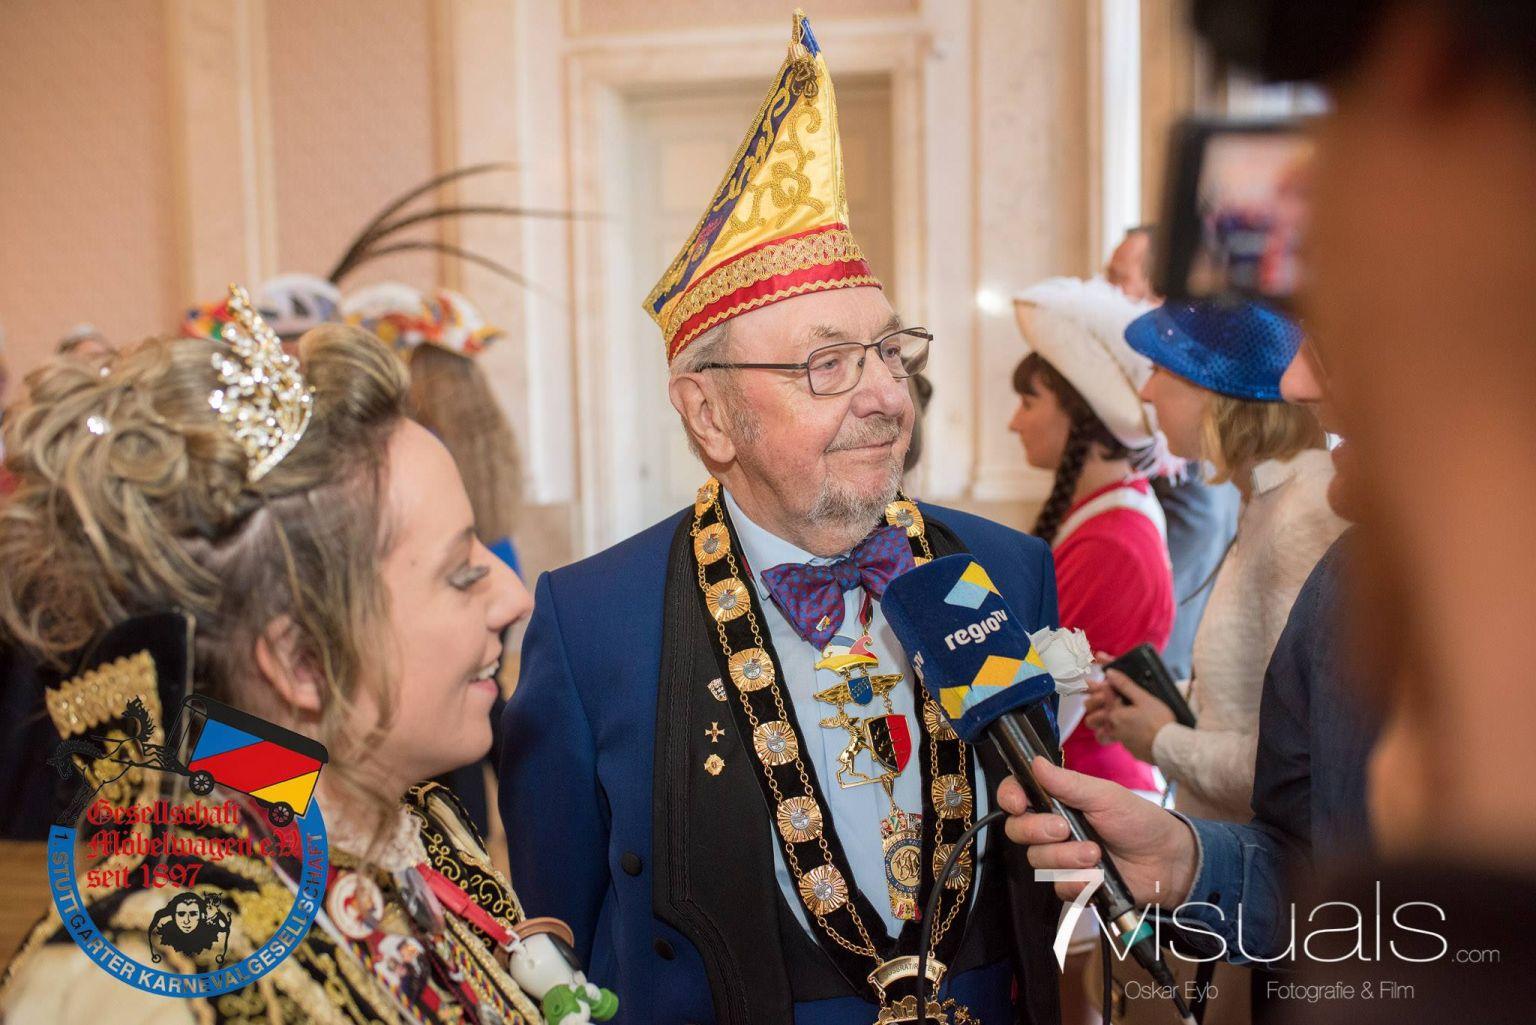 mw-empfang-minister-strobl-2018-021.jpg